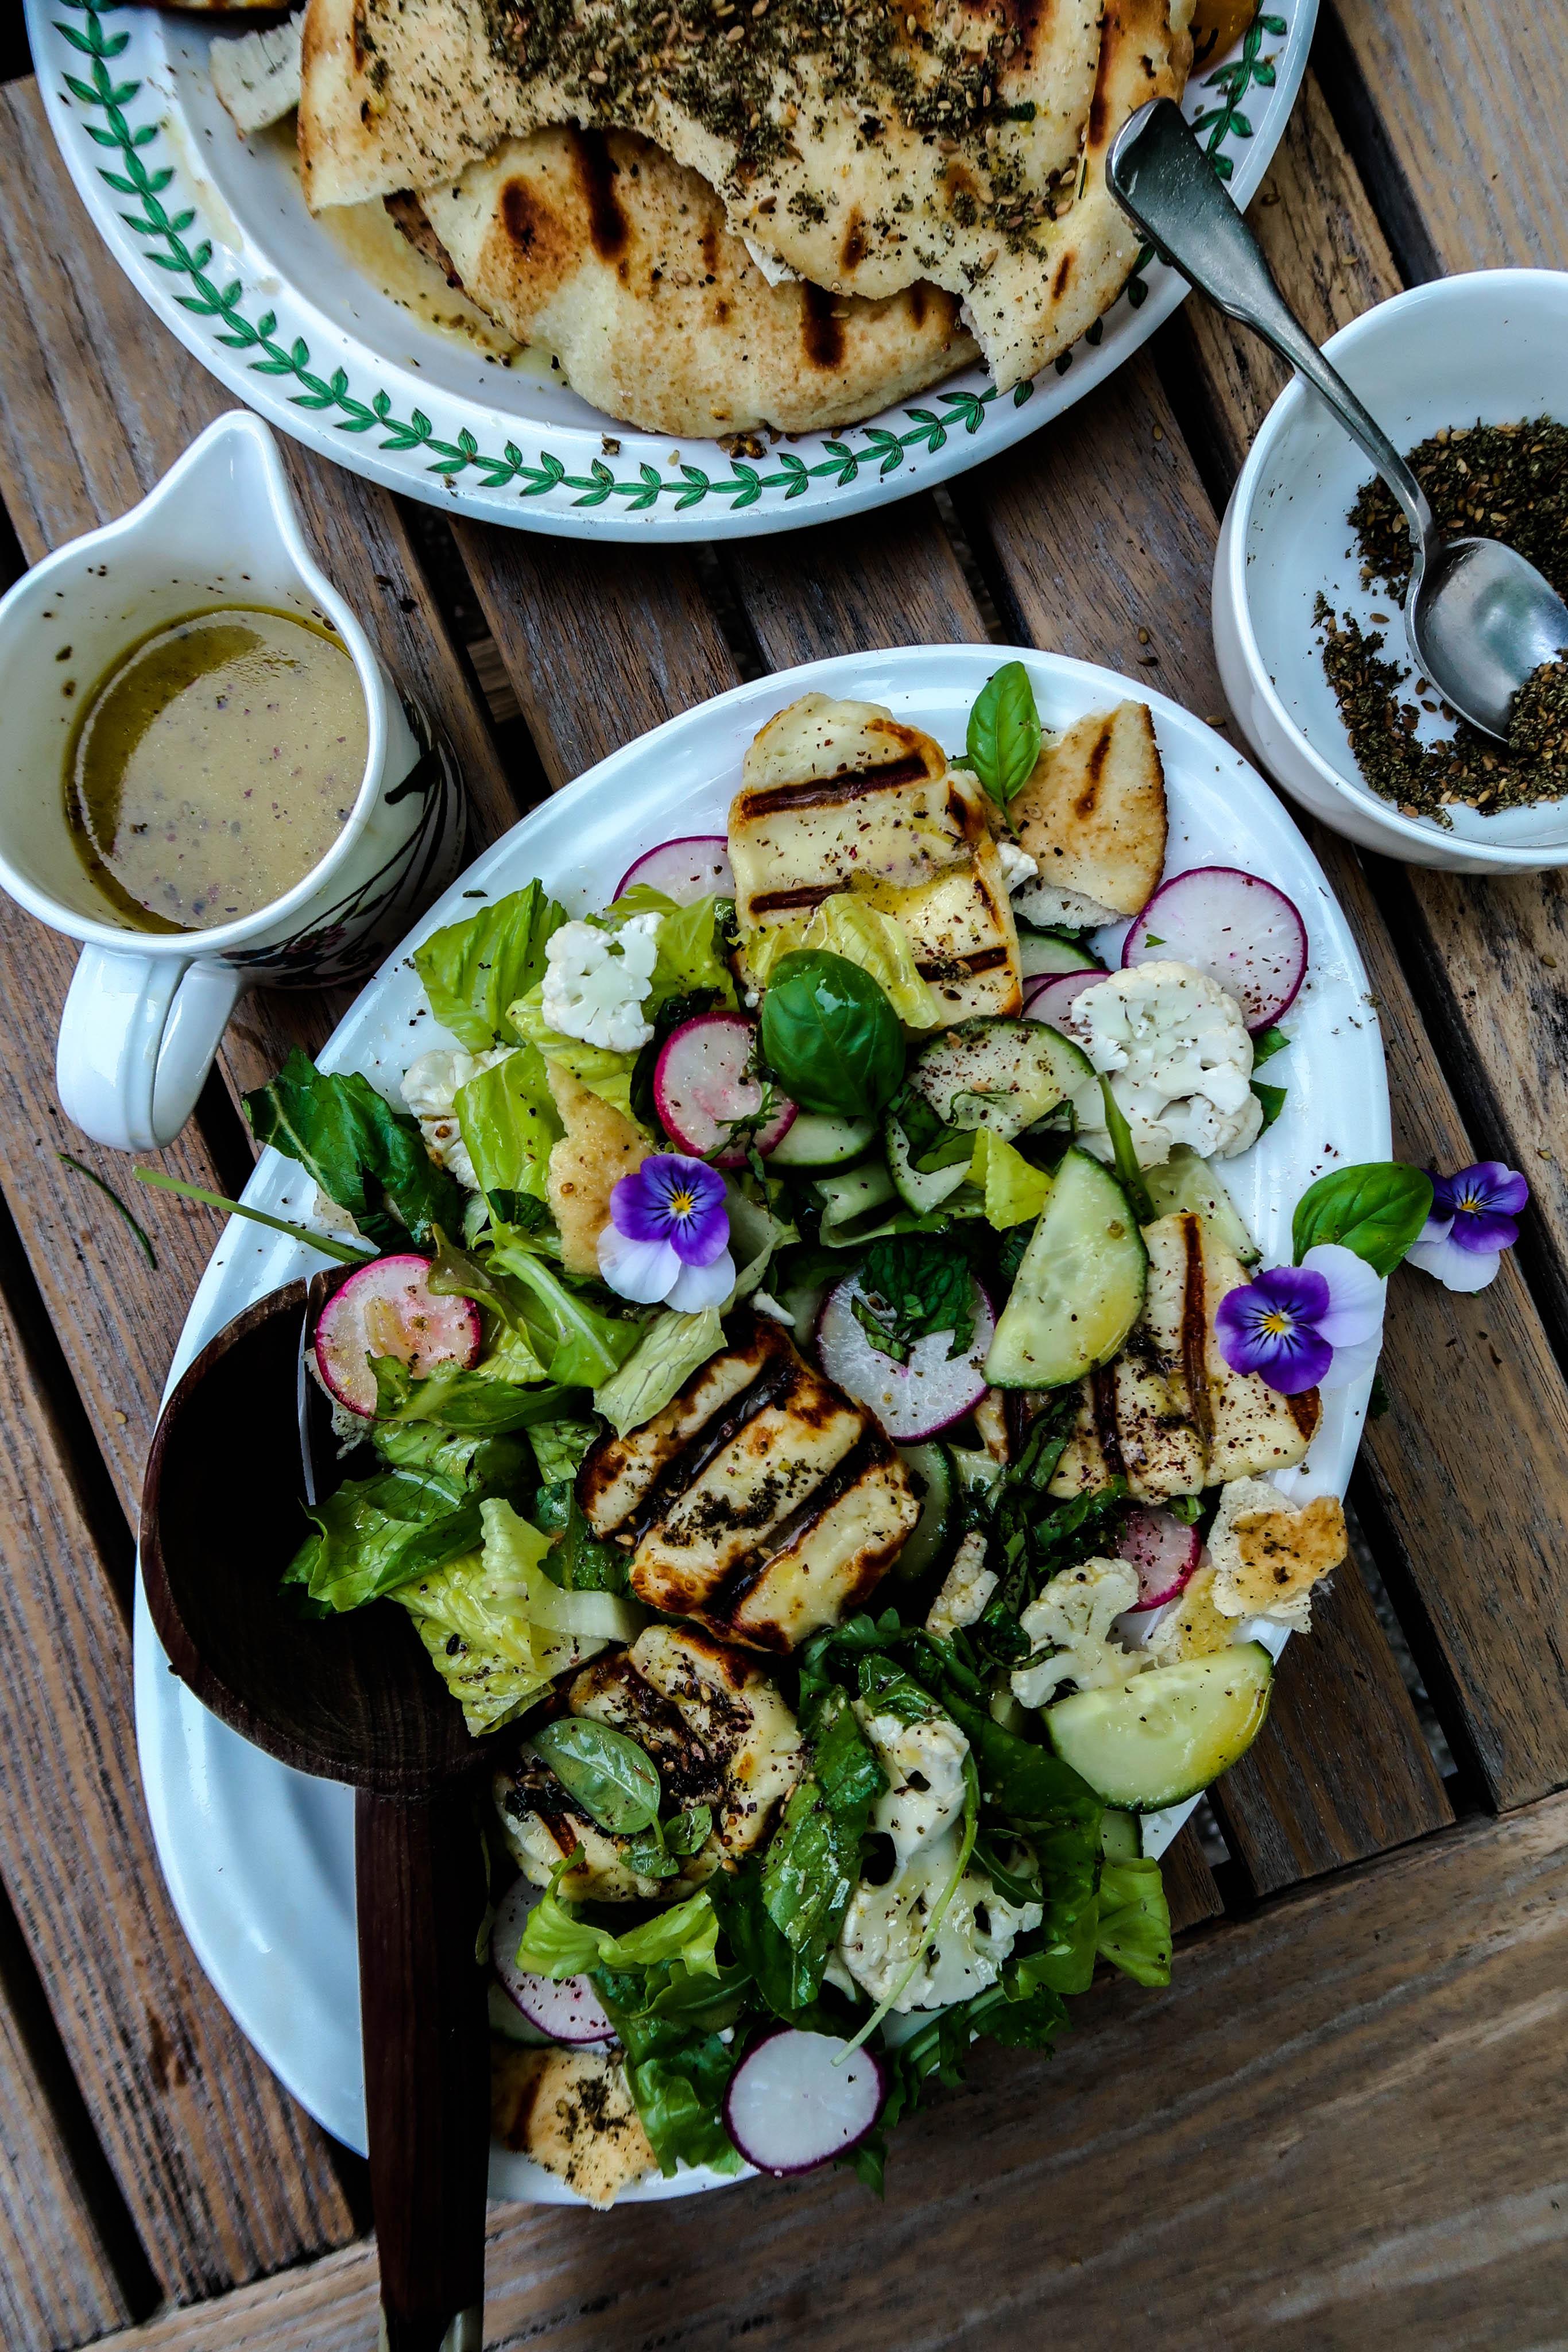 Grilled Halloumi Fattoush Salad